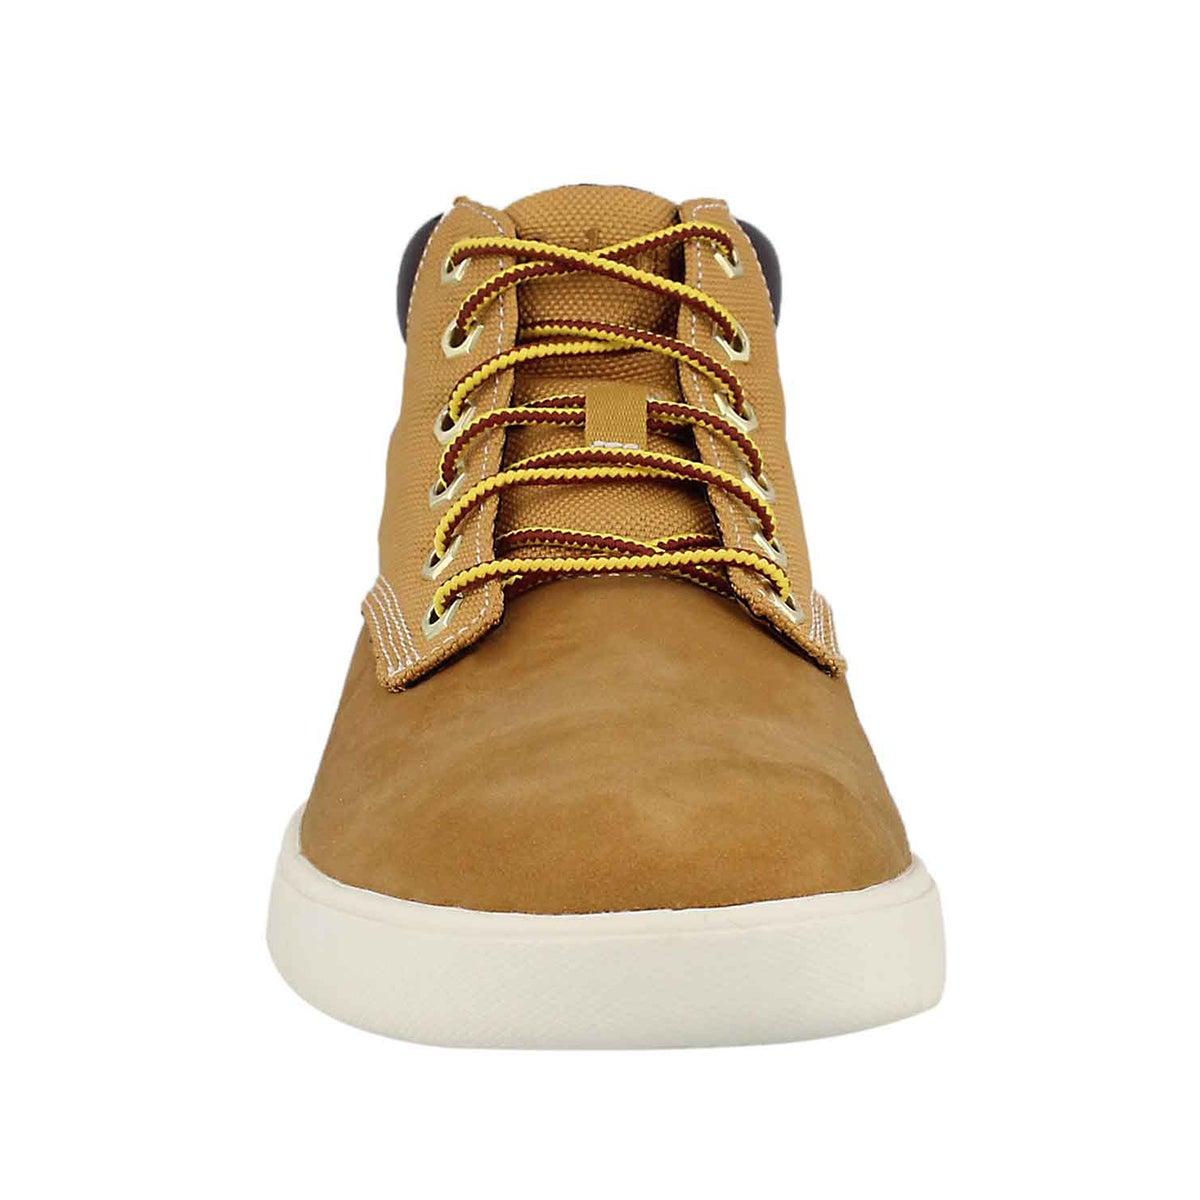 Mns Groveton Plain Toe wheat chukka boot